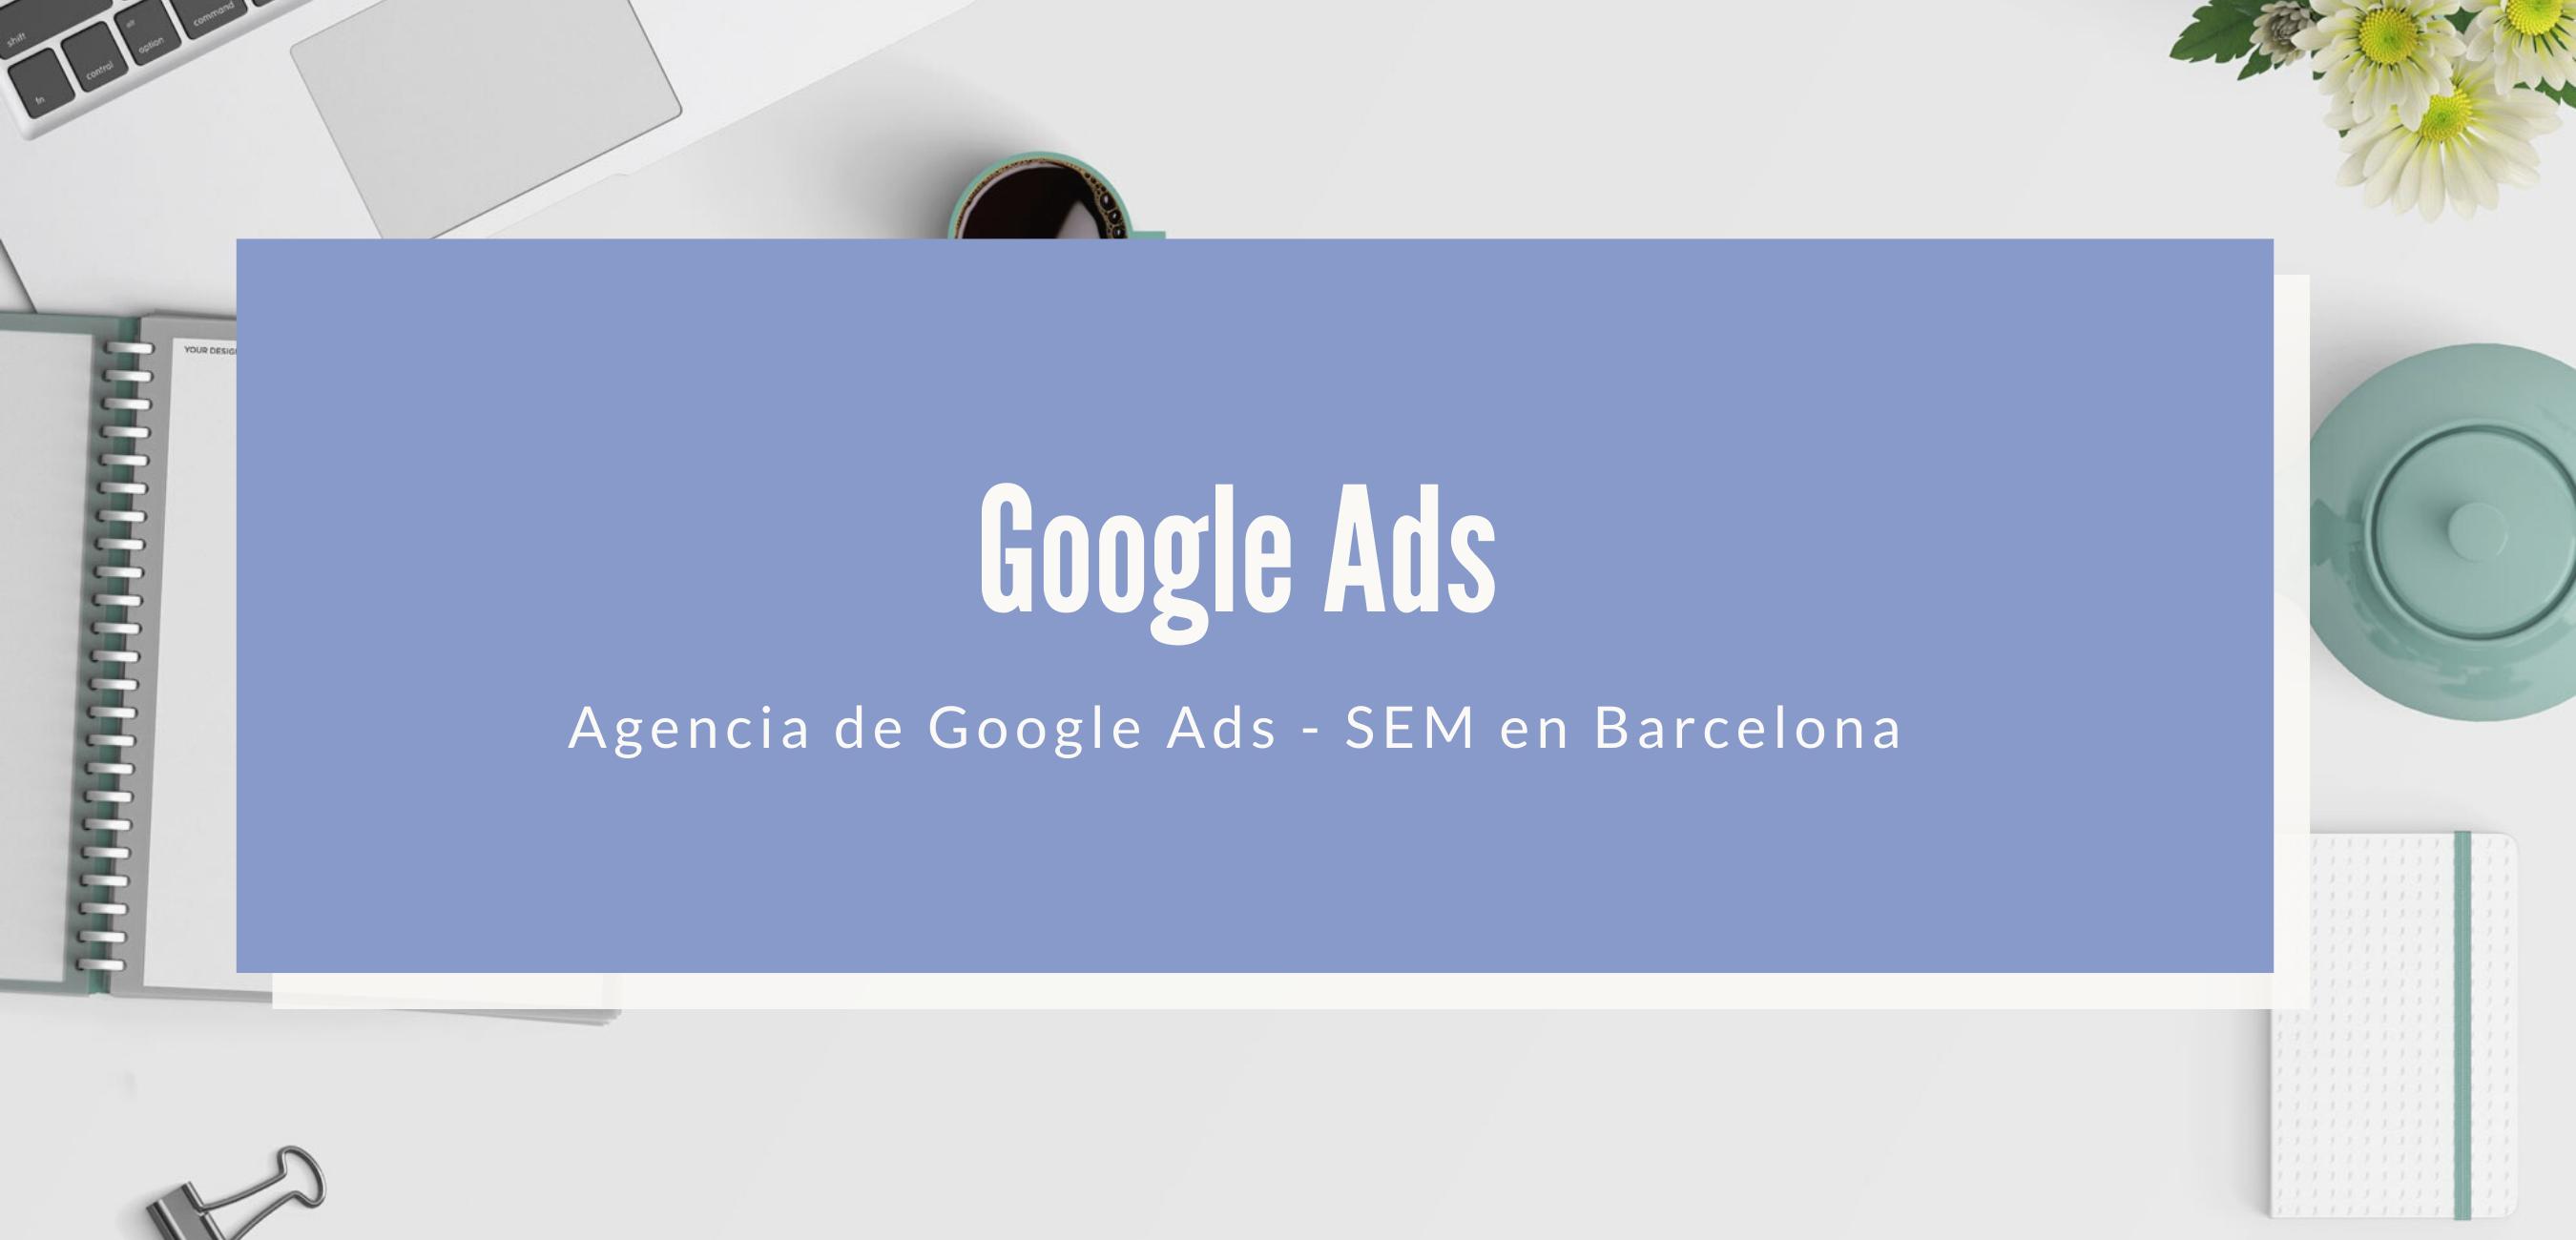 Google Ads - SEM